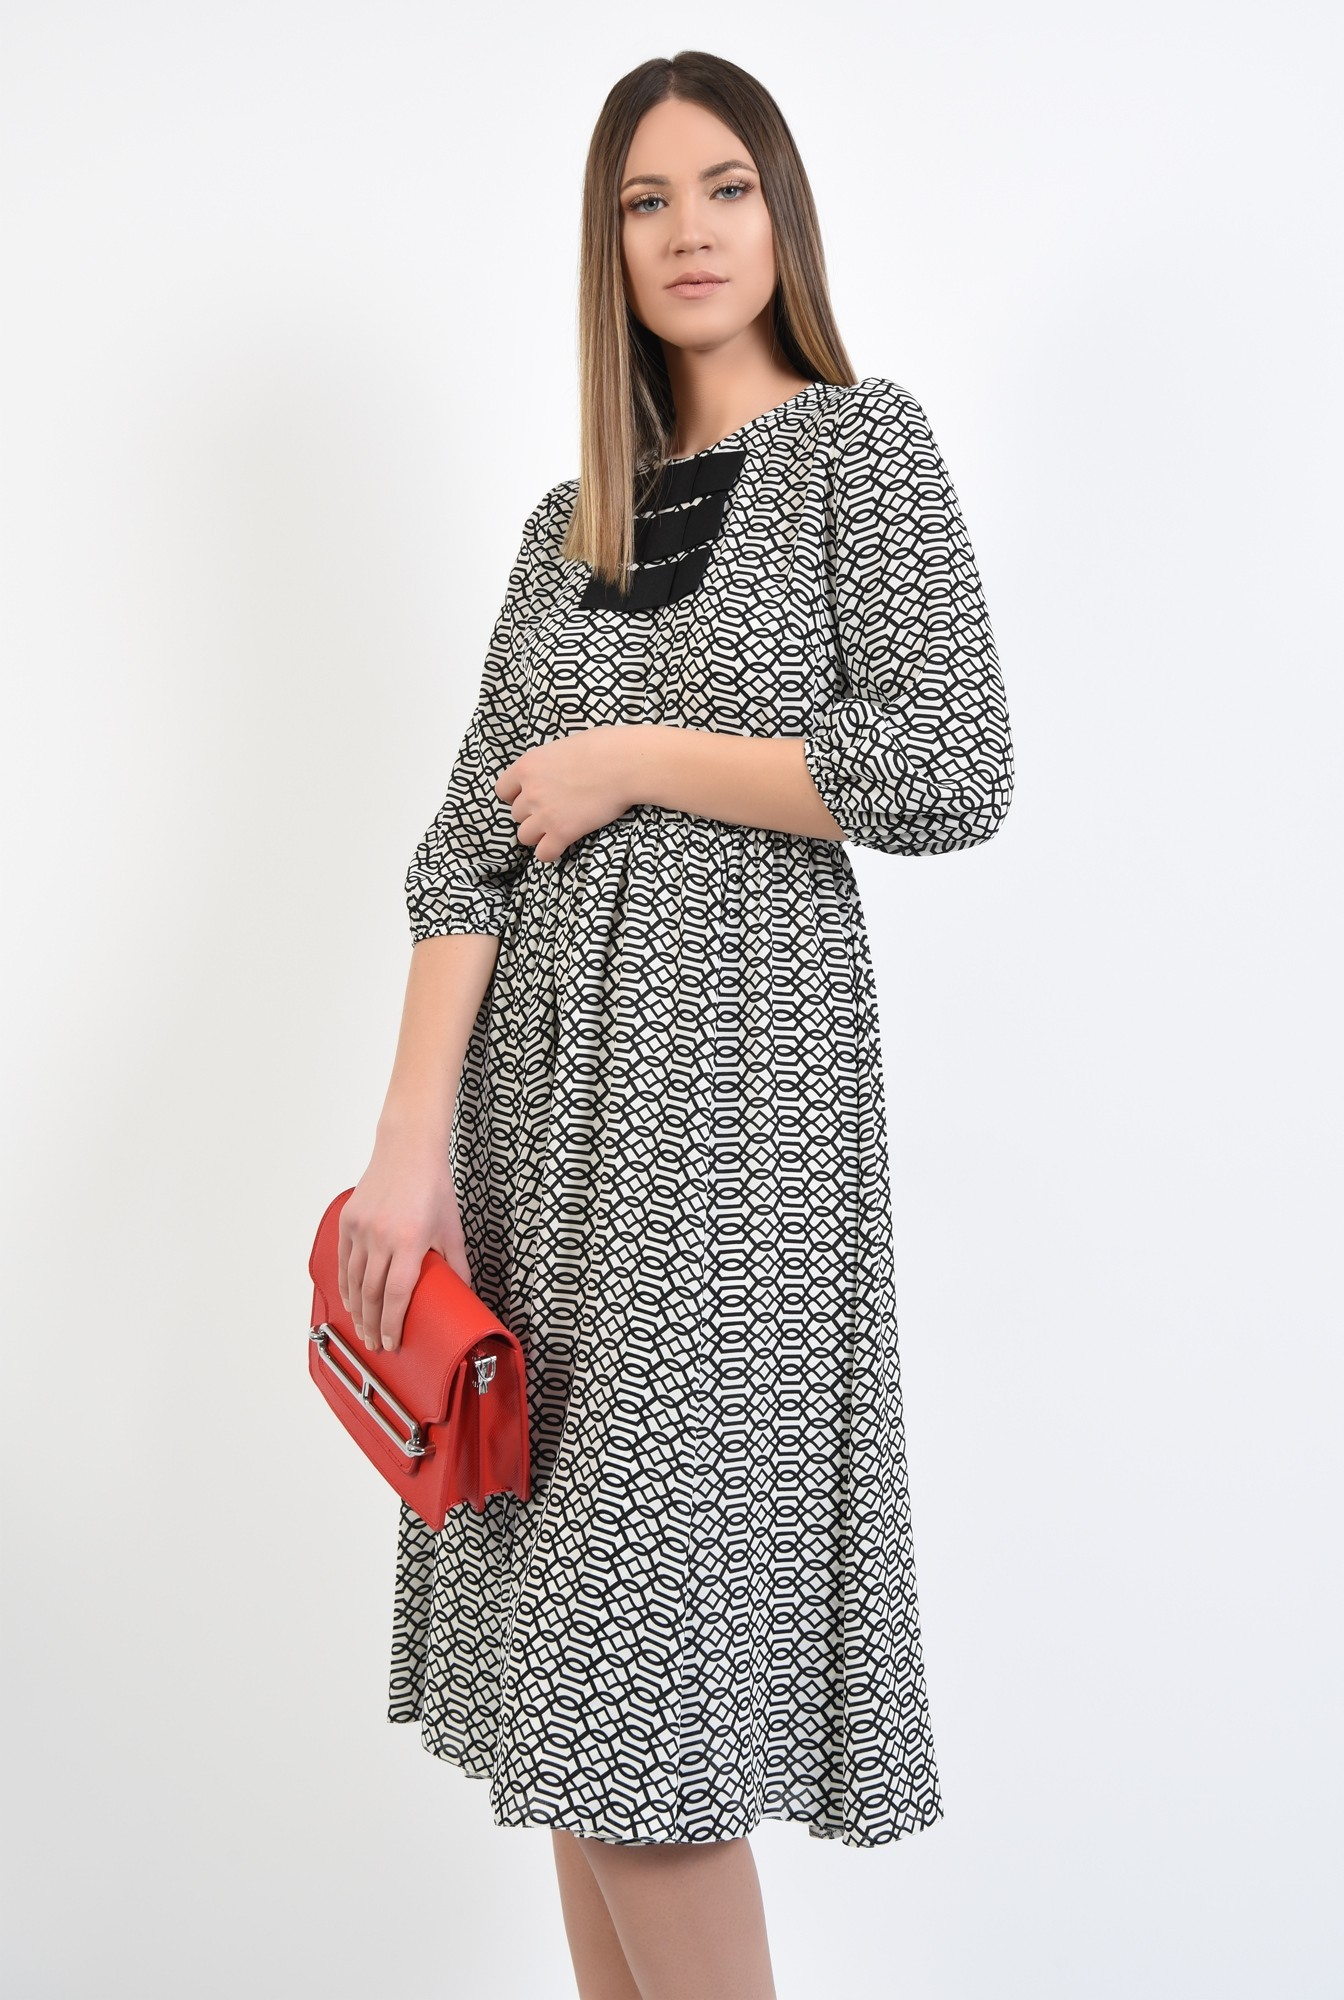 0 - 360 - rochie imprimata, anchior petrecut, maneci 3/4, elastic la talie